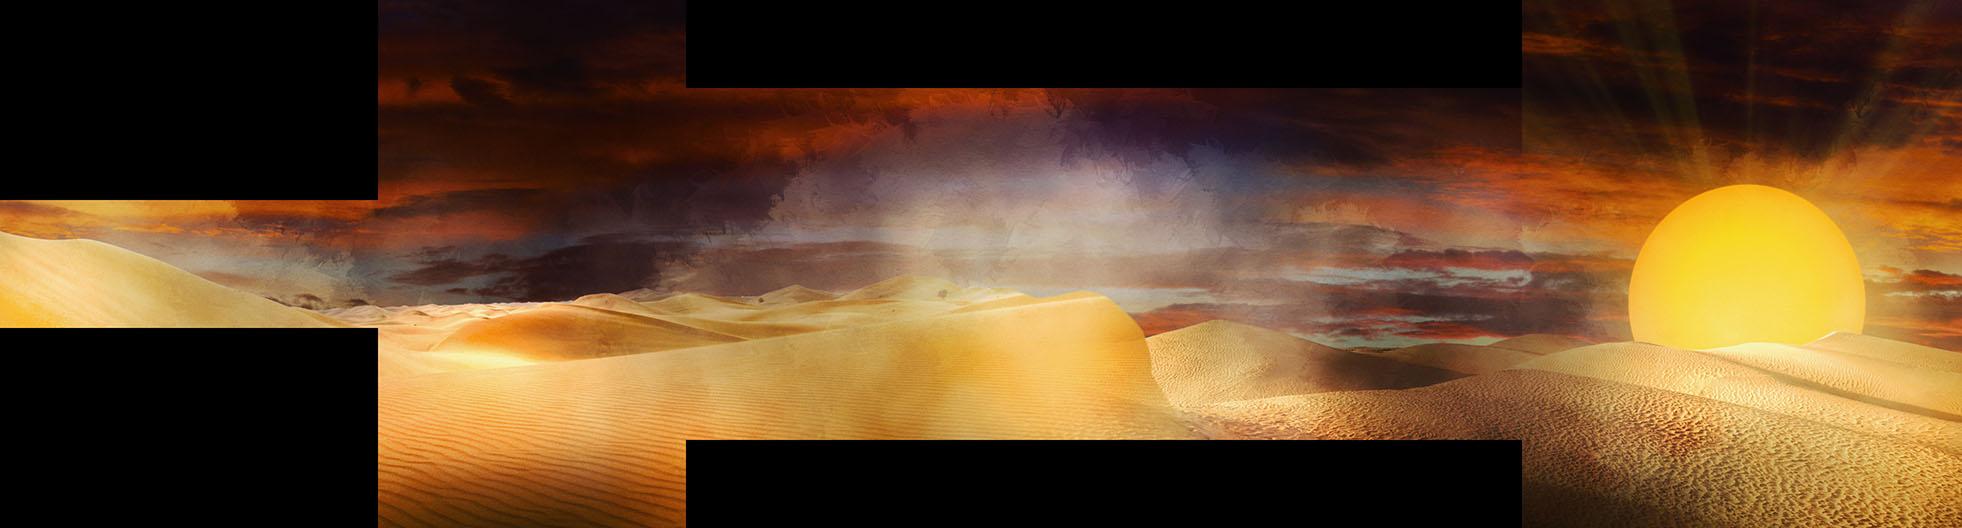 Desert Got Talent Israel by Elad Magdasi